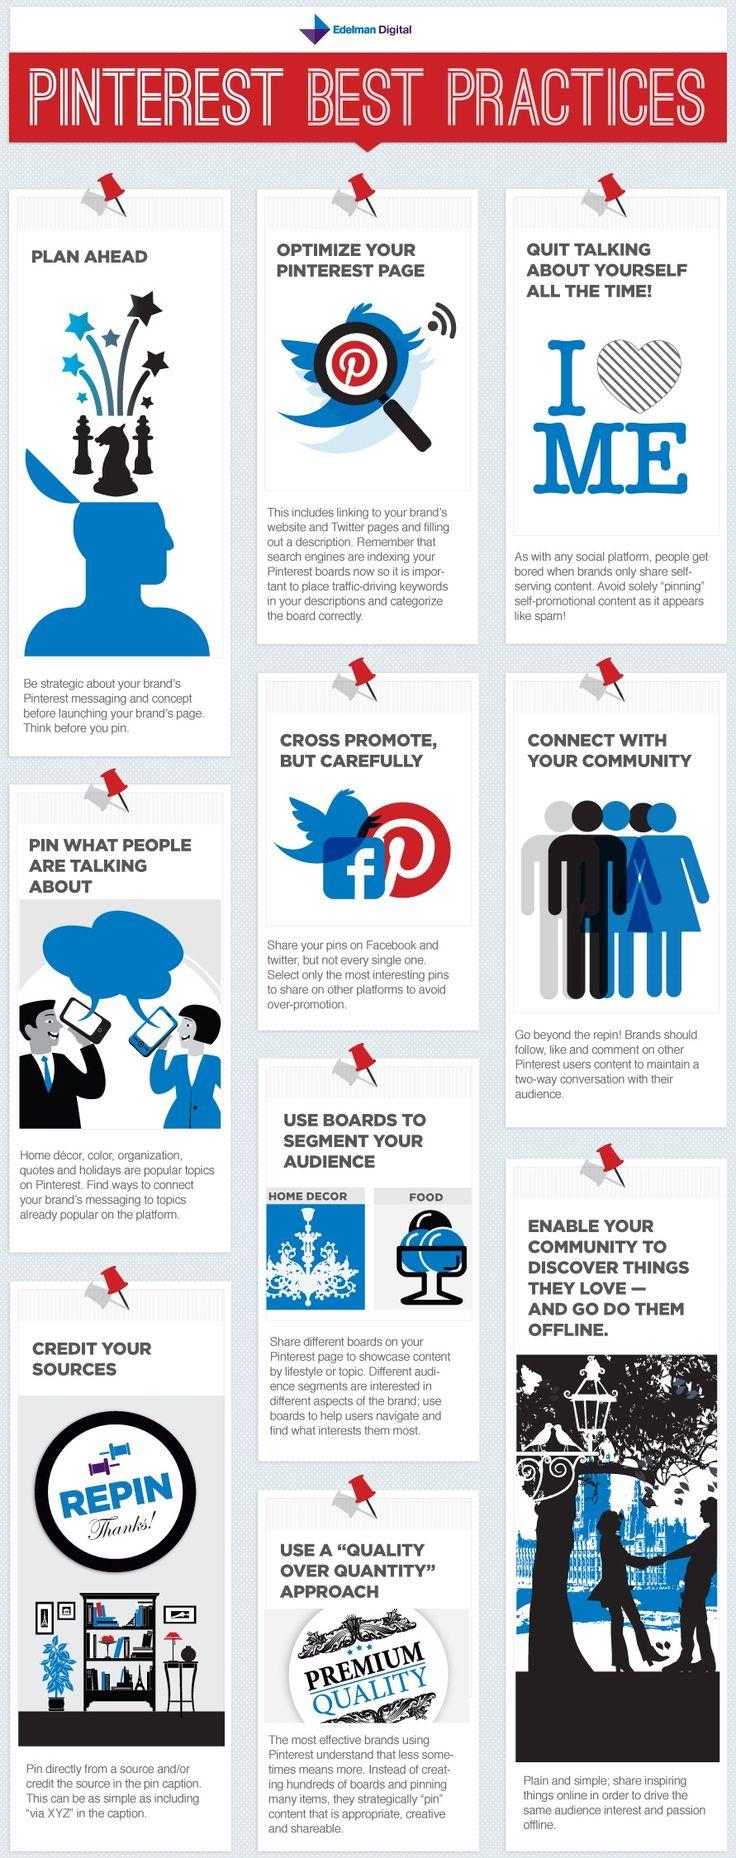 Pinterest, tips, best practices, infographic, insight, #pinterest